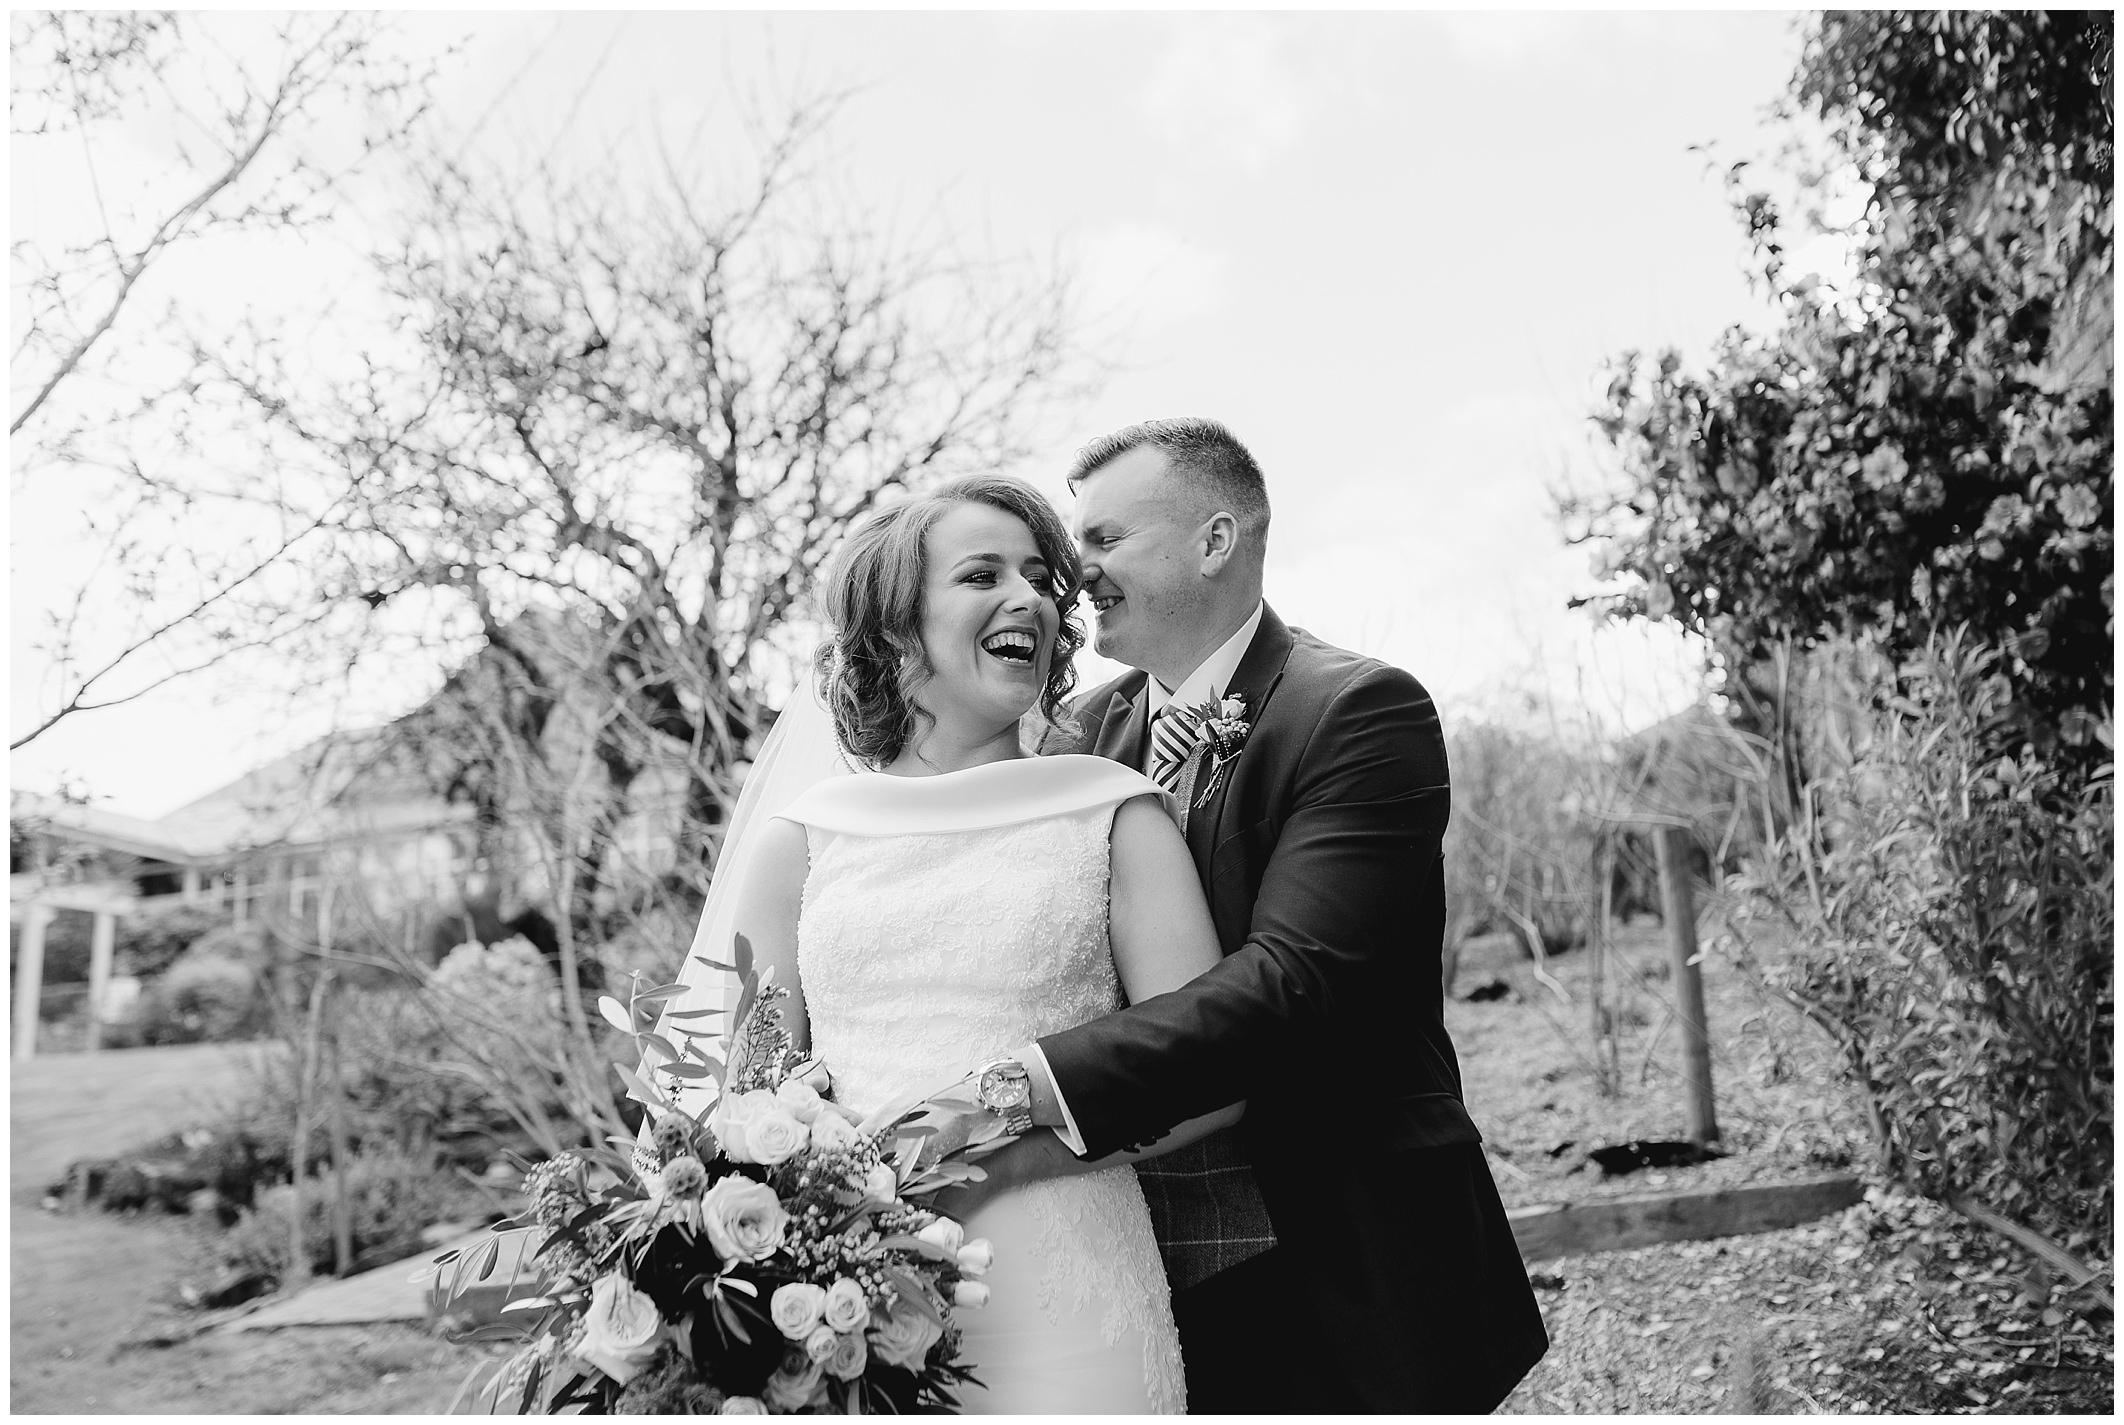 corick-house-wedding-hannah-gary-jude-browne-photography_0060.jpg